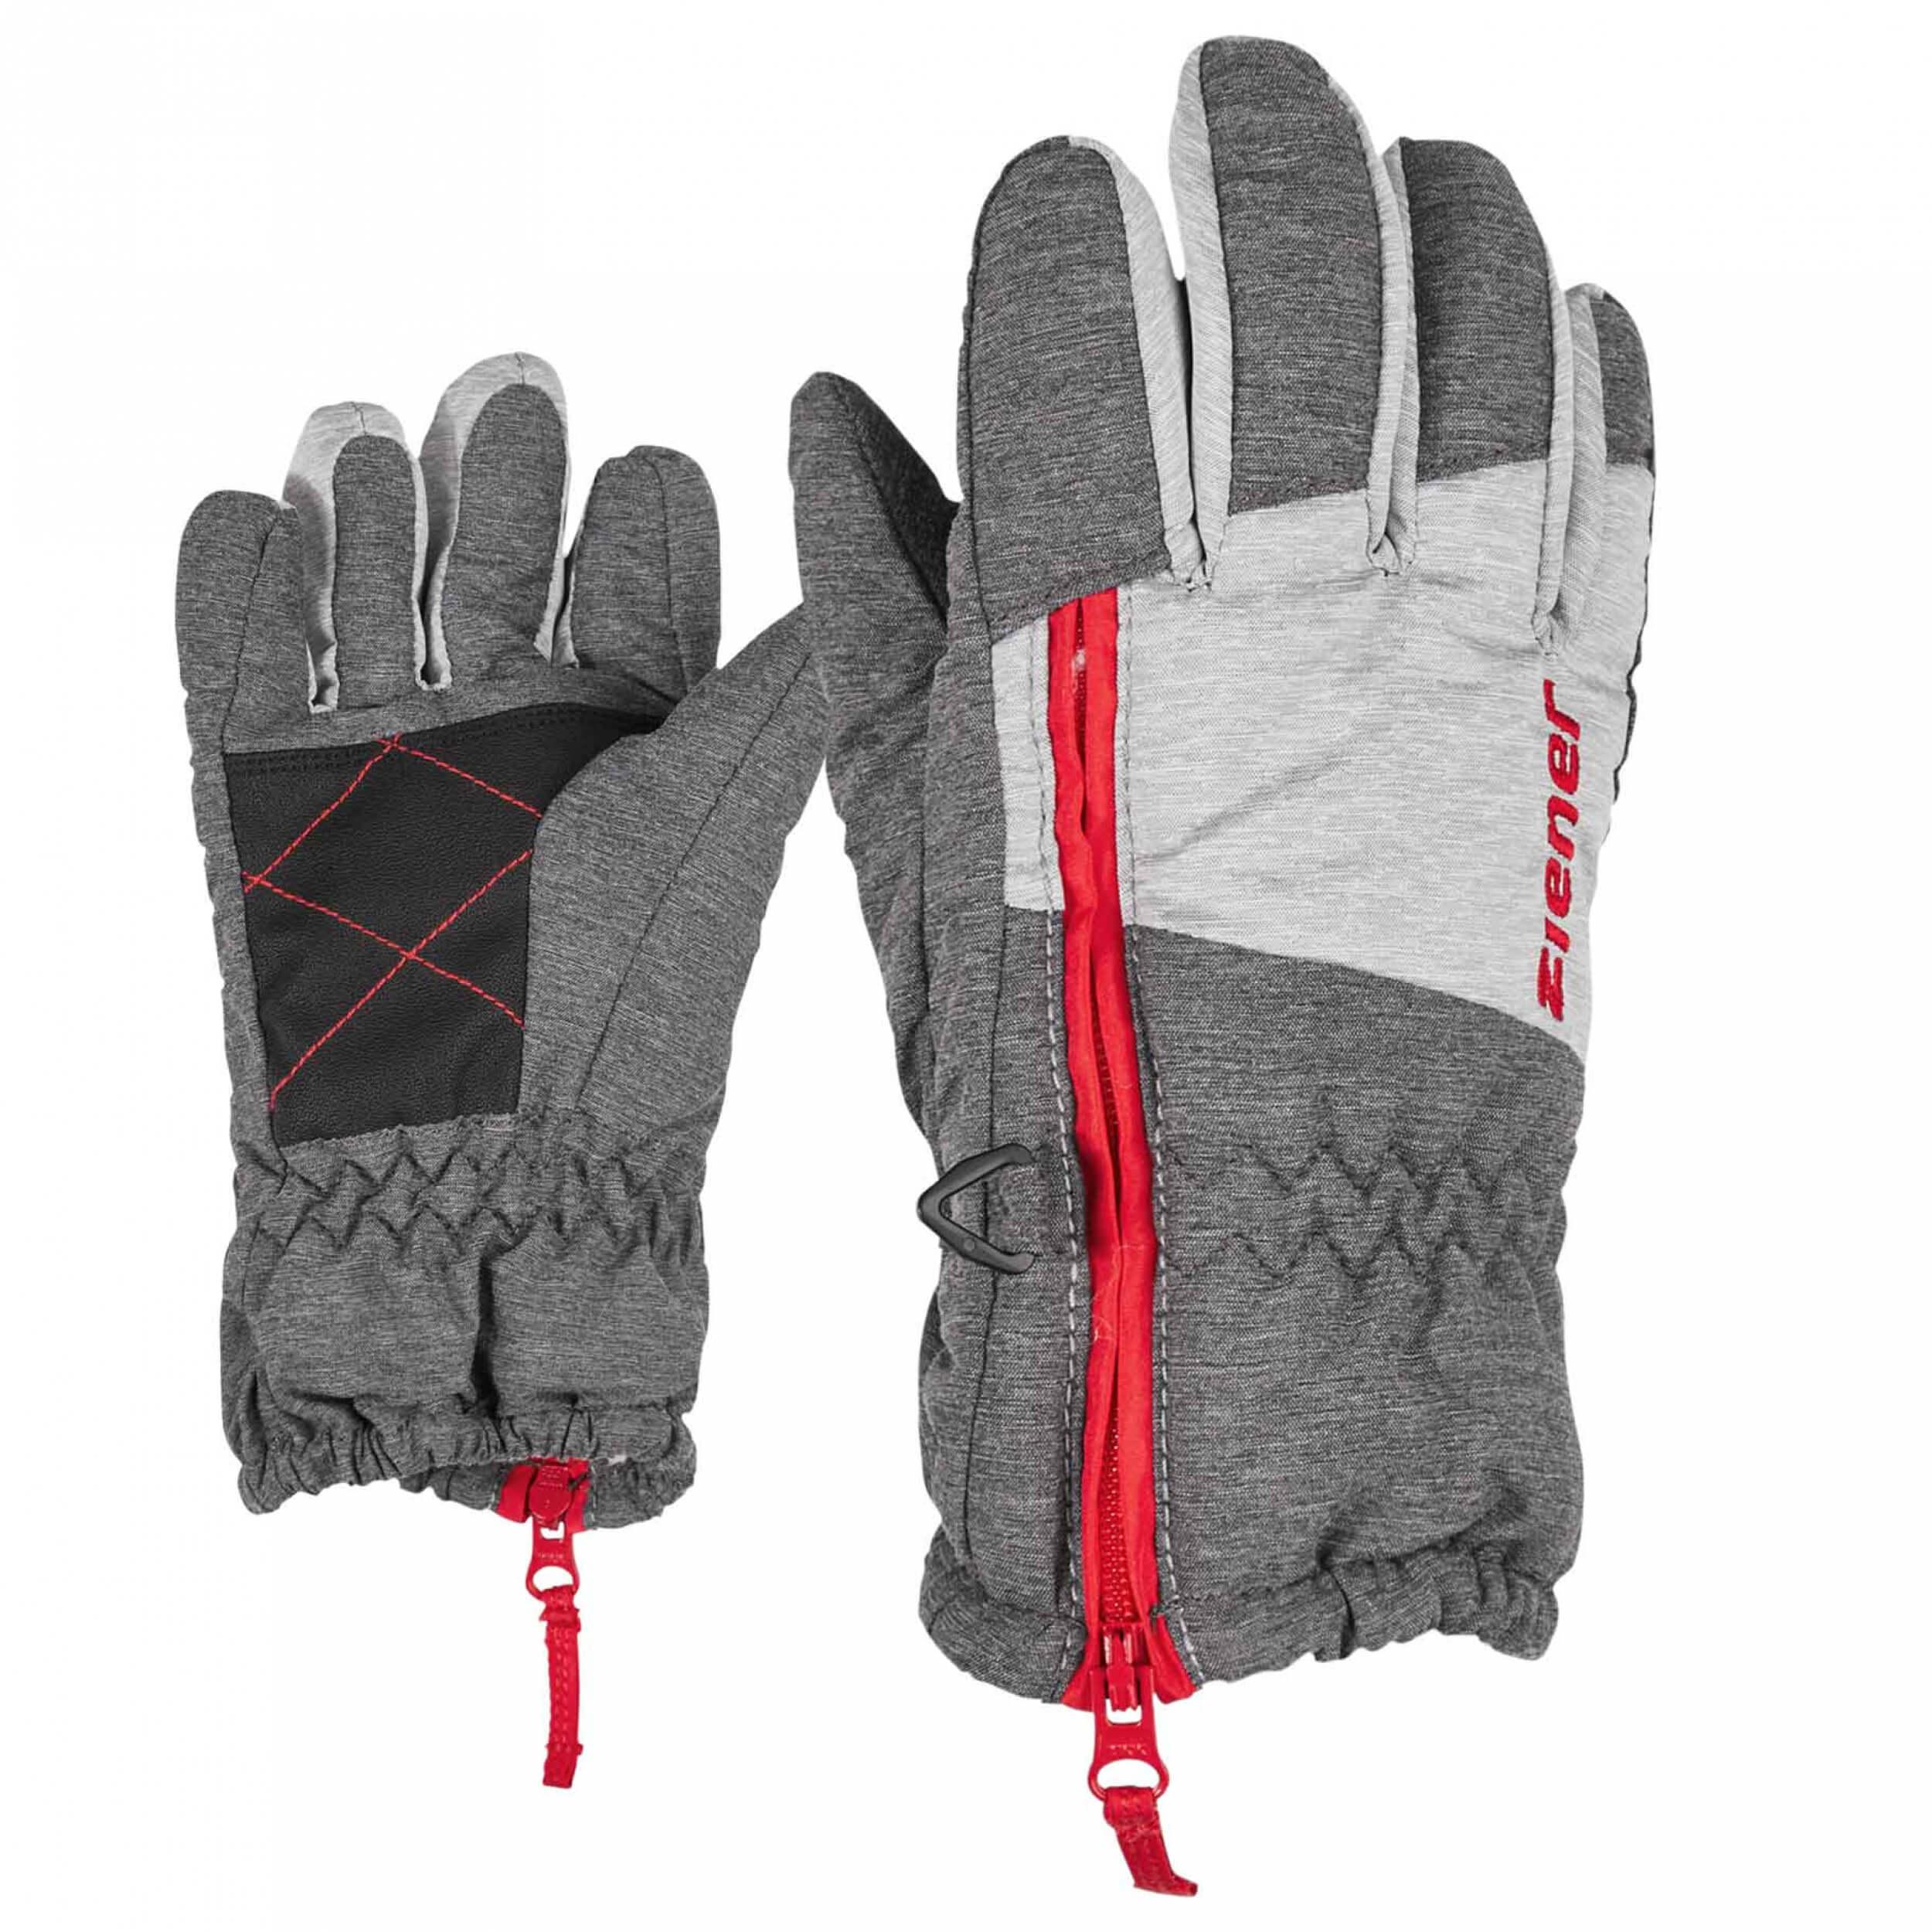 ZIENER Kinder mini Handschuhe LUDO grau 822